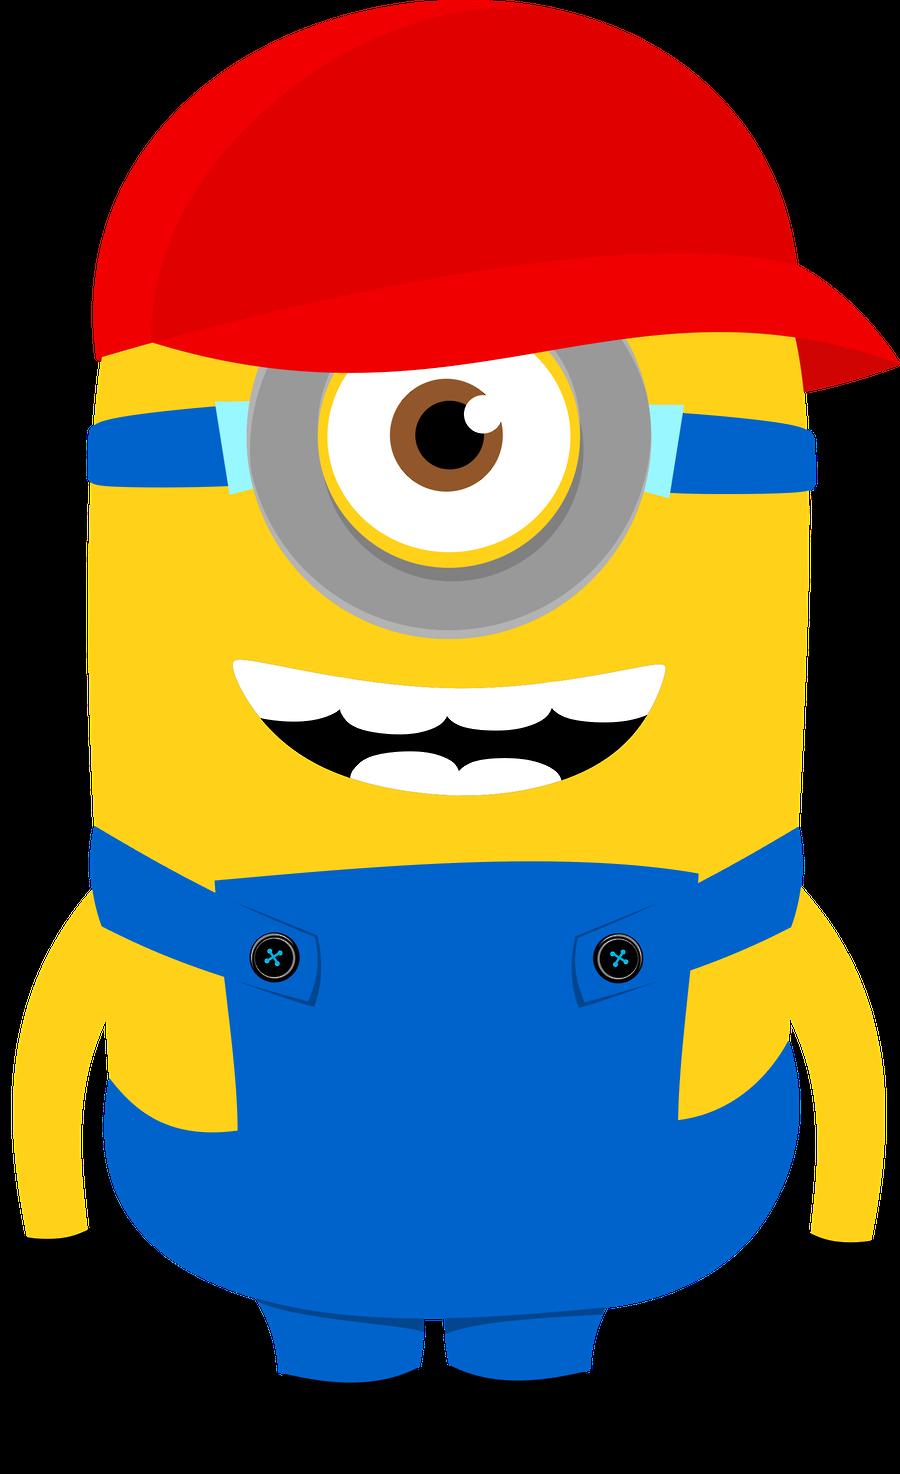 Happy thanksgiving minion clipart jpg Meu malvado favorito - jzy1P6tfBdTKP.png - Minus | Minion characters ... jpg